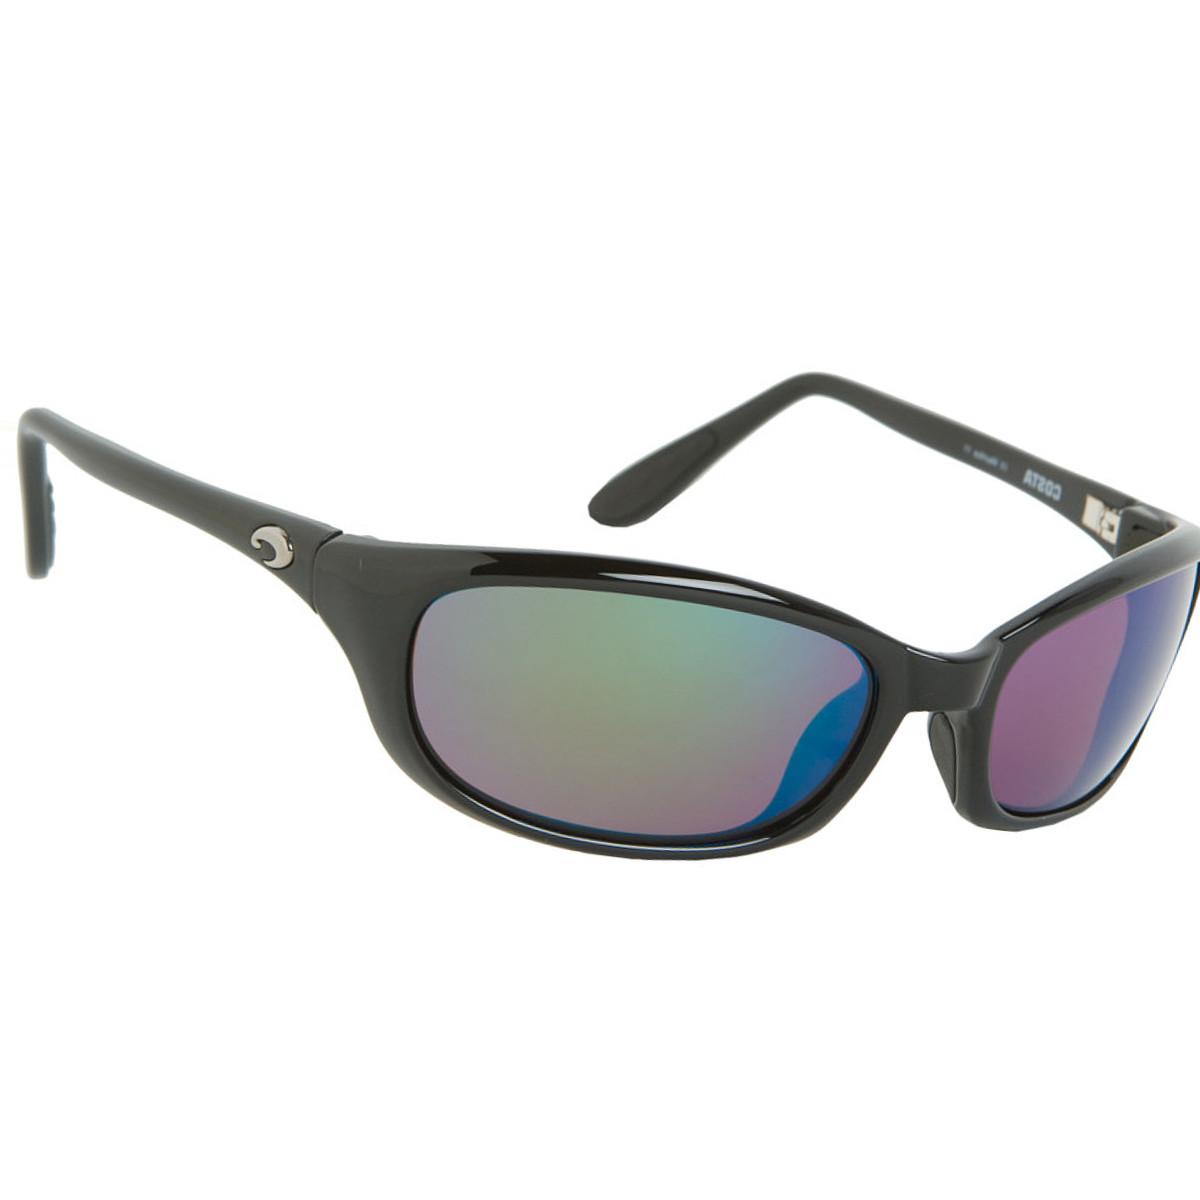 Costa Harpoon 580G Polarized Sunglasses - Women's